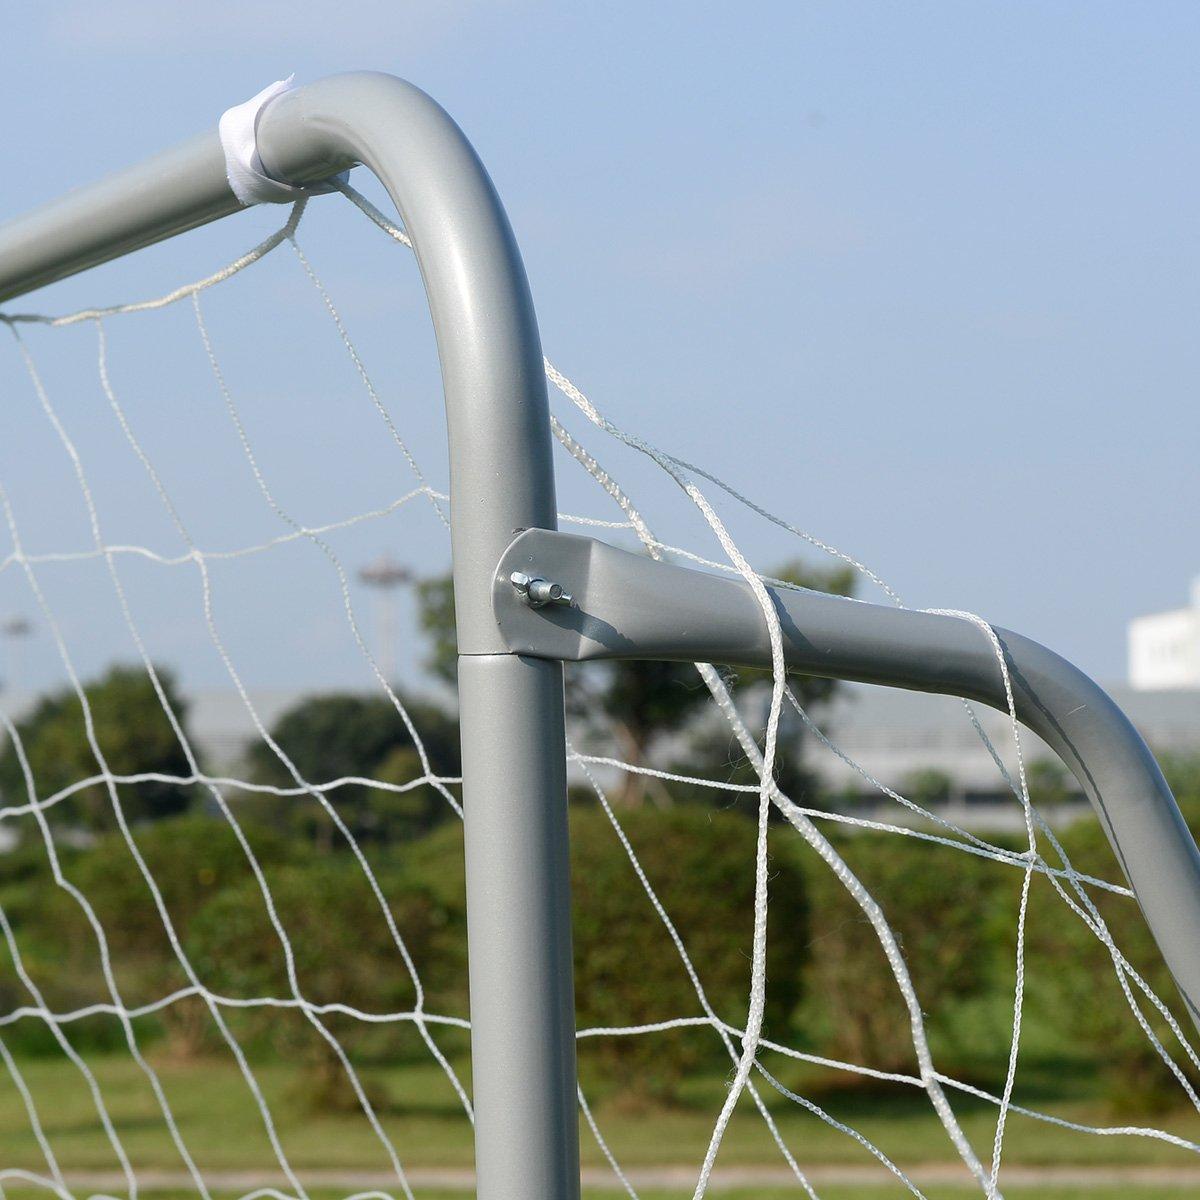 Giantex 12 x 6 Ft Soccer Goal w/ Net, Steel Frame and Velcro Straps, Indoor Outdoor Backyard Kids Children Soccer Goal by Giantex (Image #5)